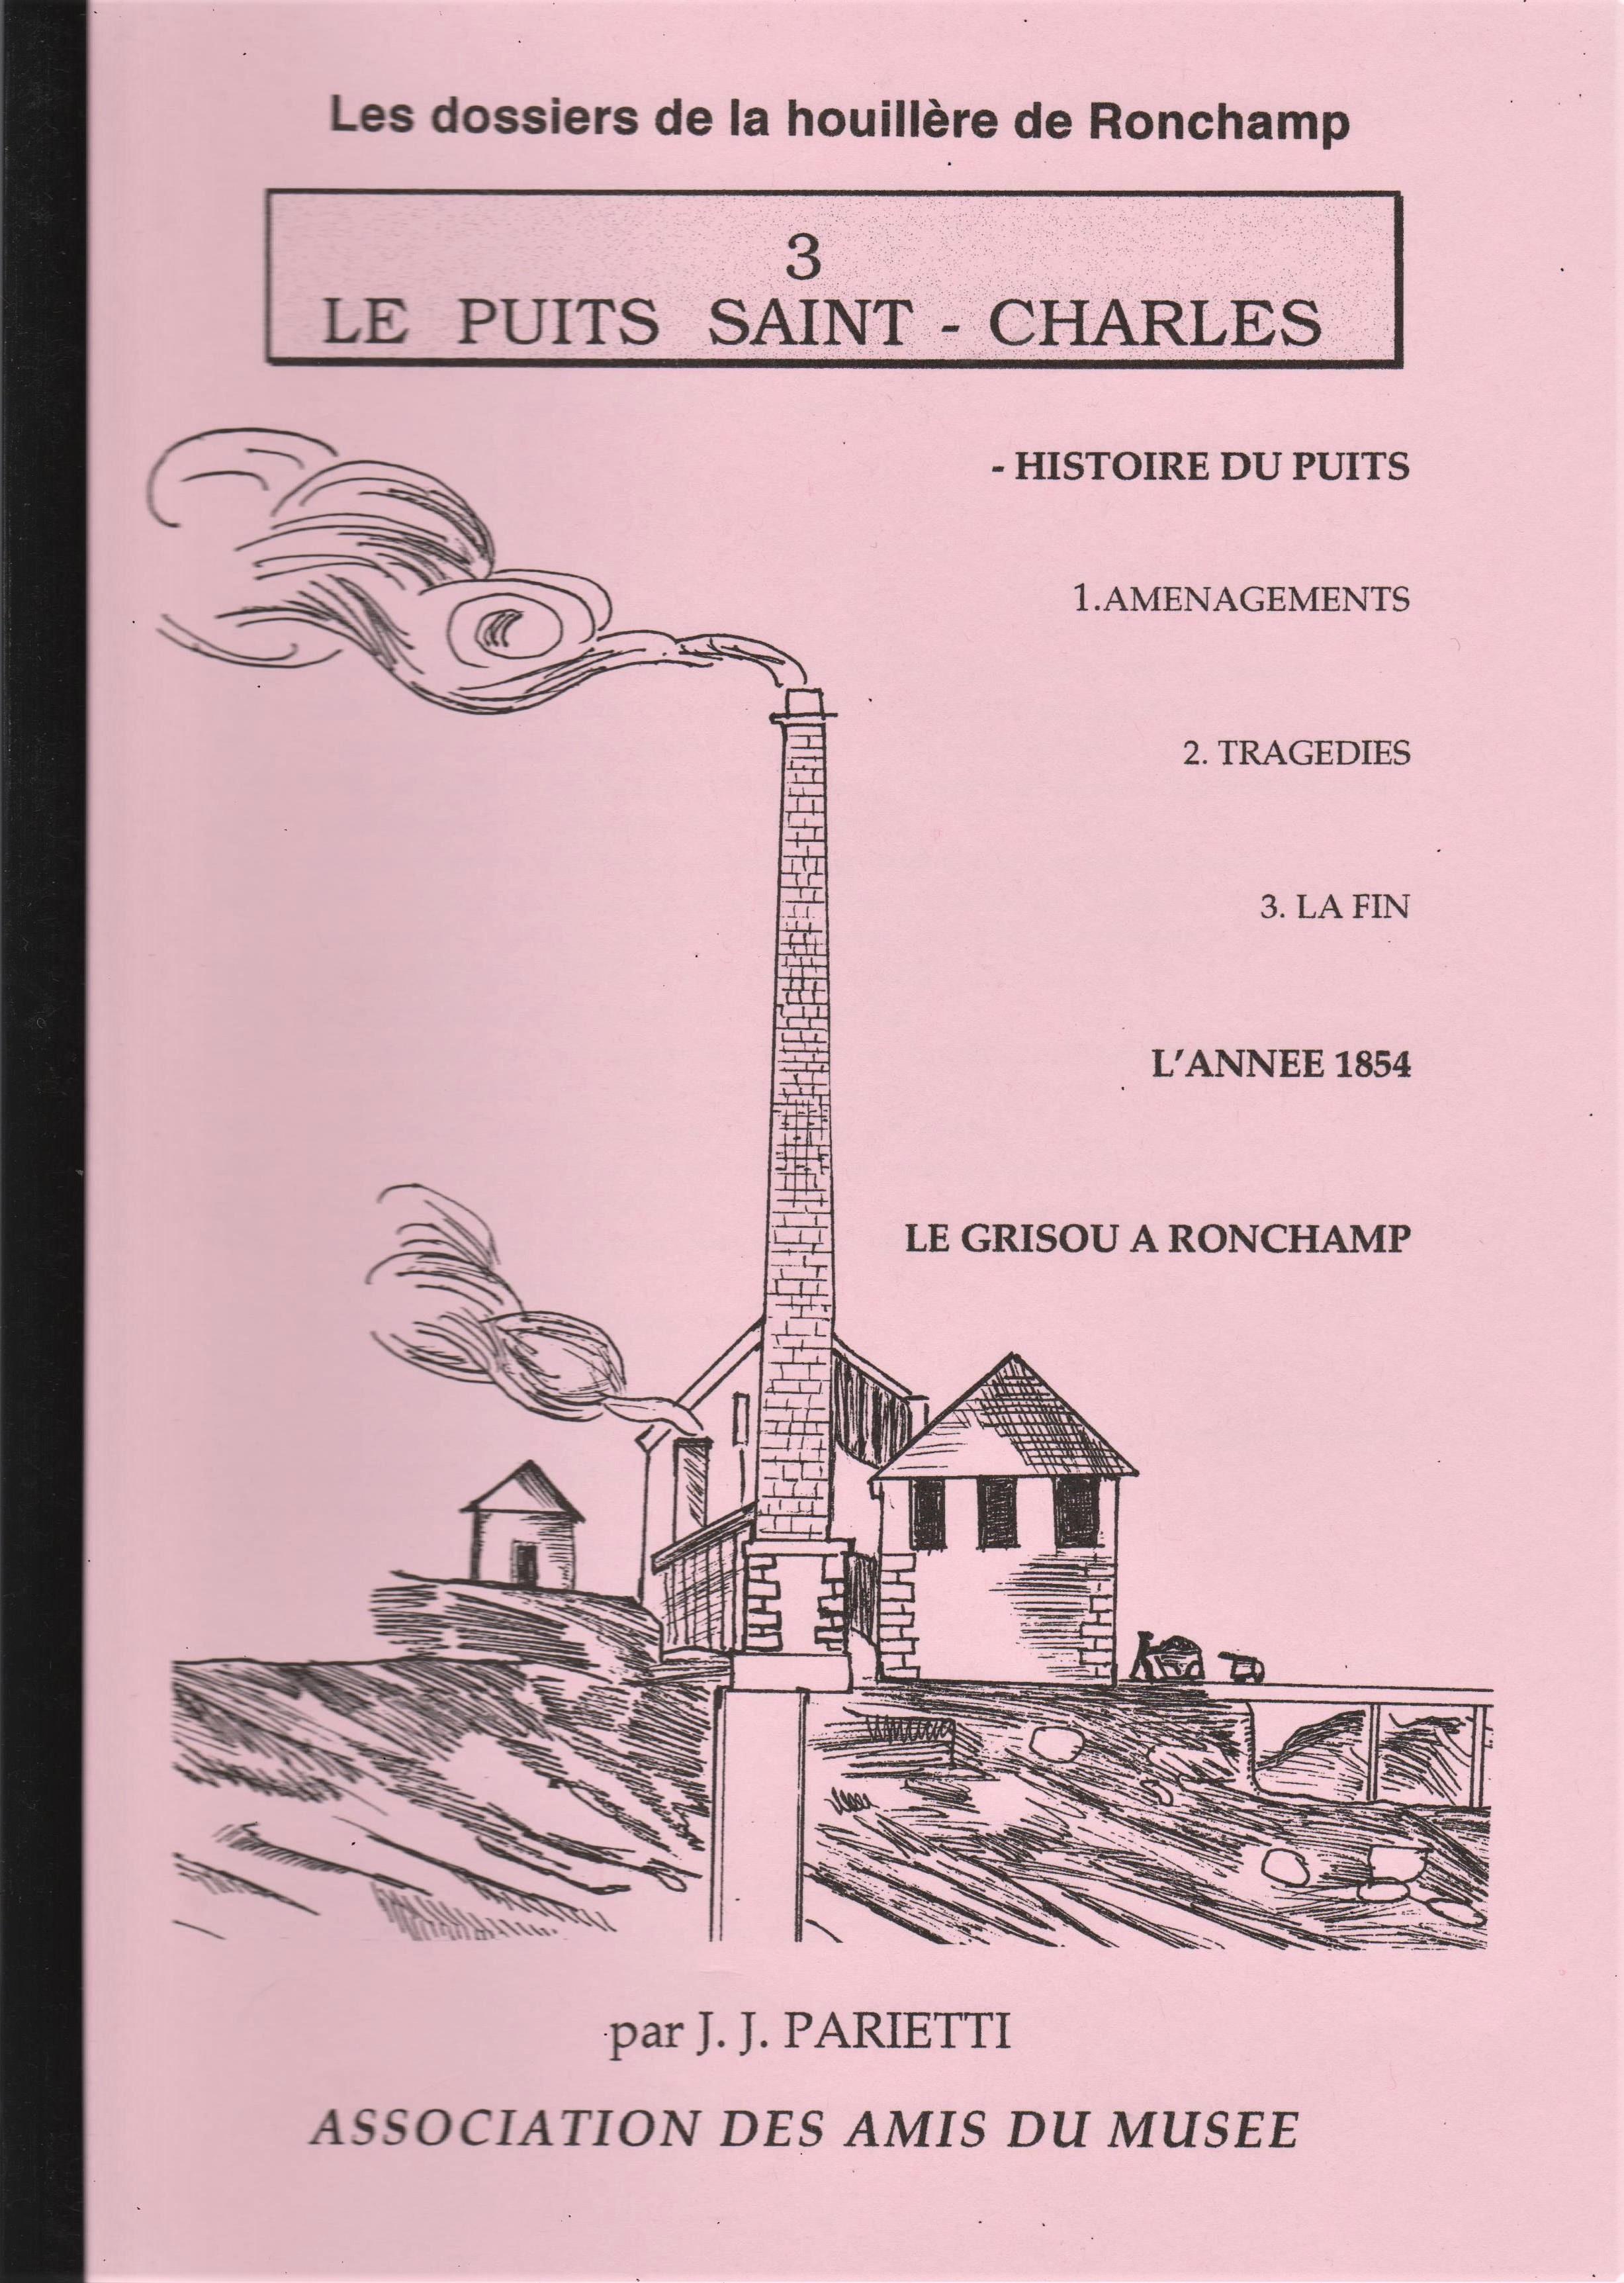 Le puits Saint-Charles